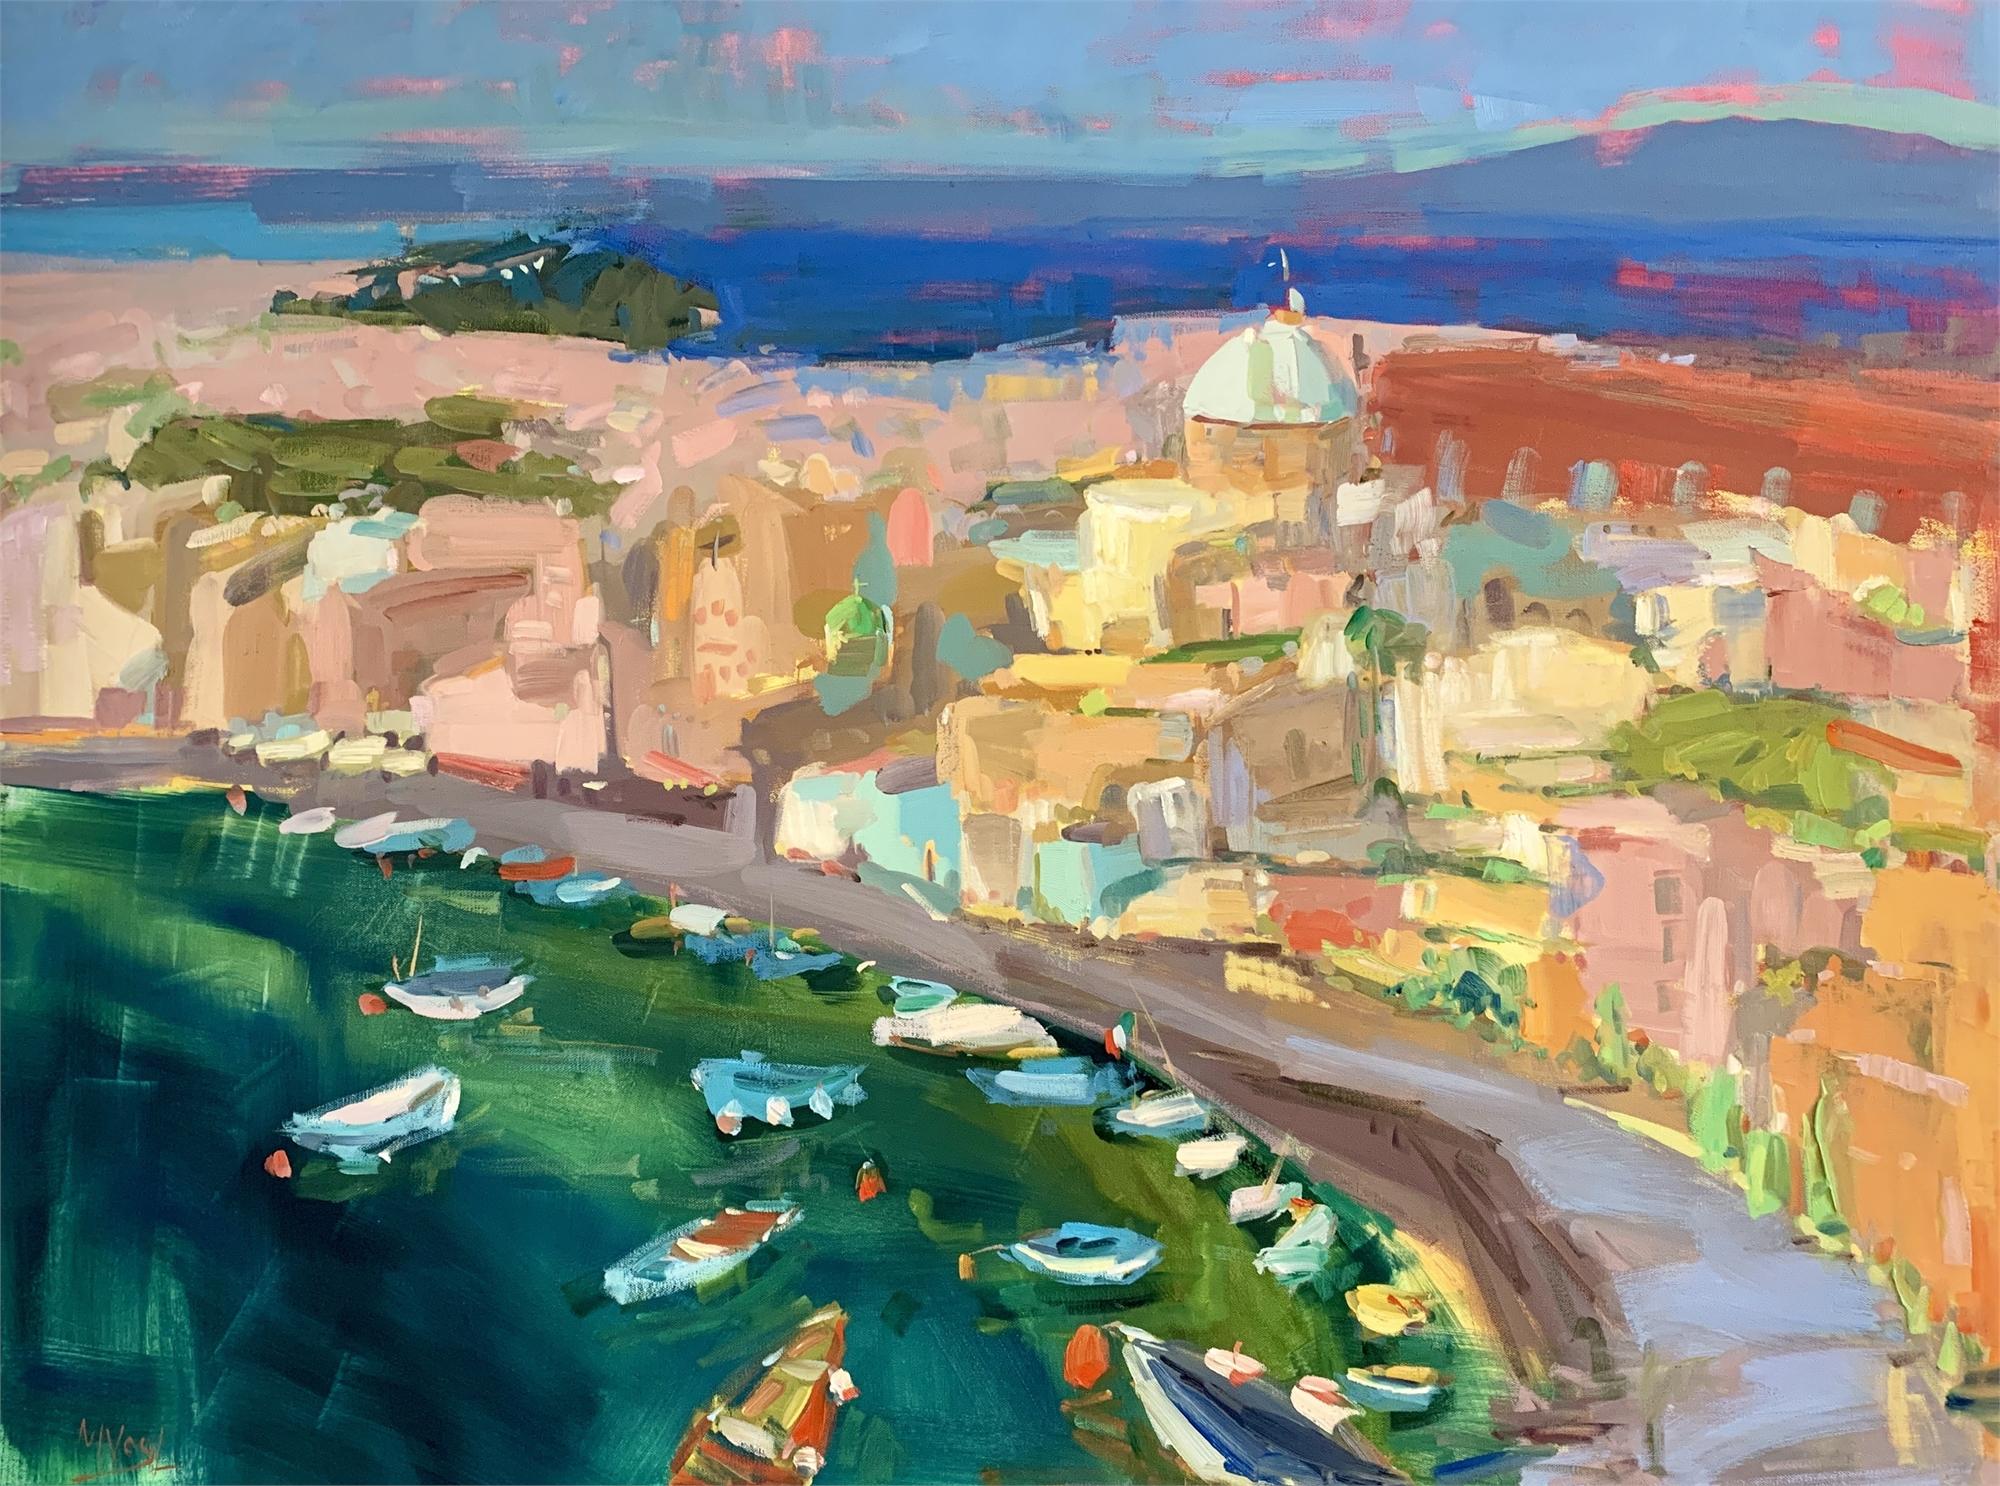 Corricella Bay by Marissa Vogl